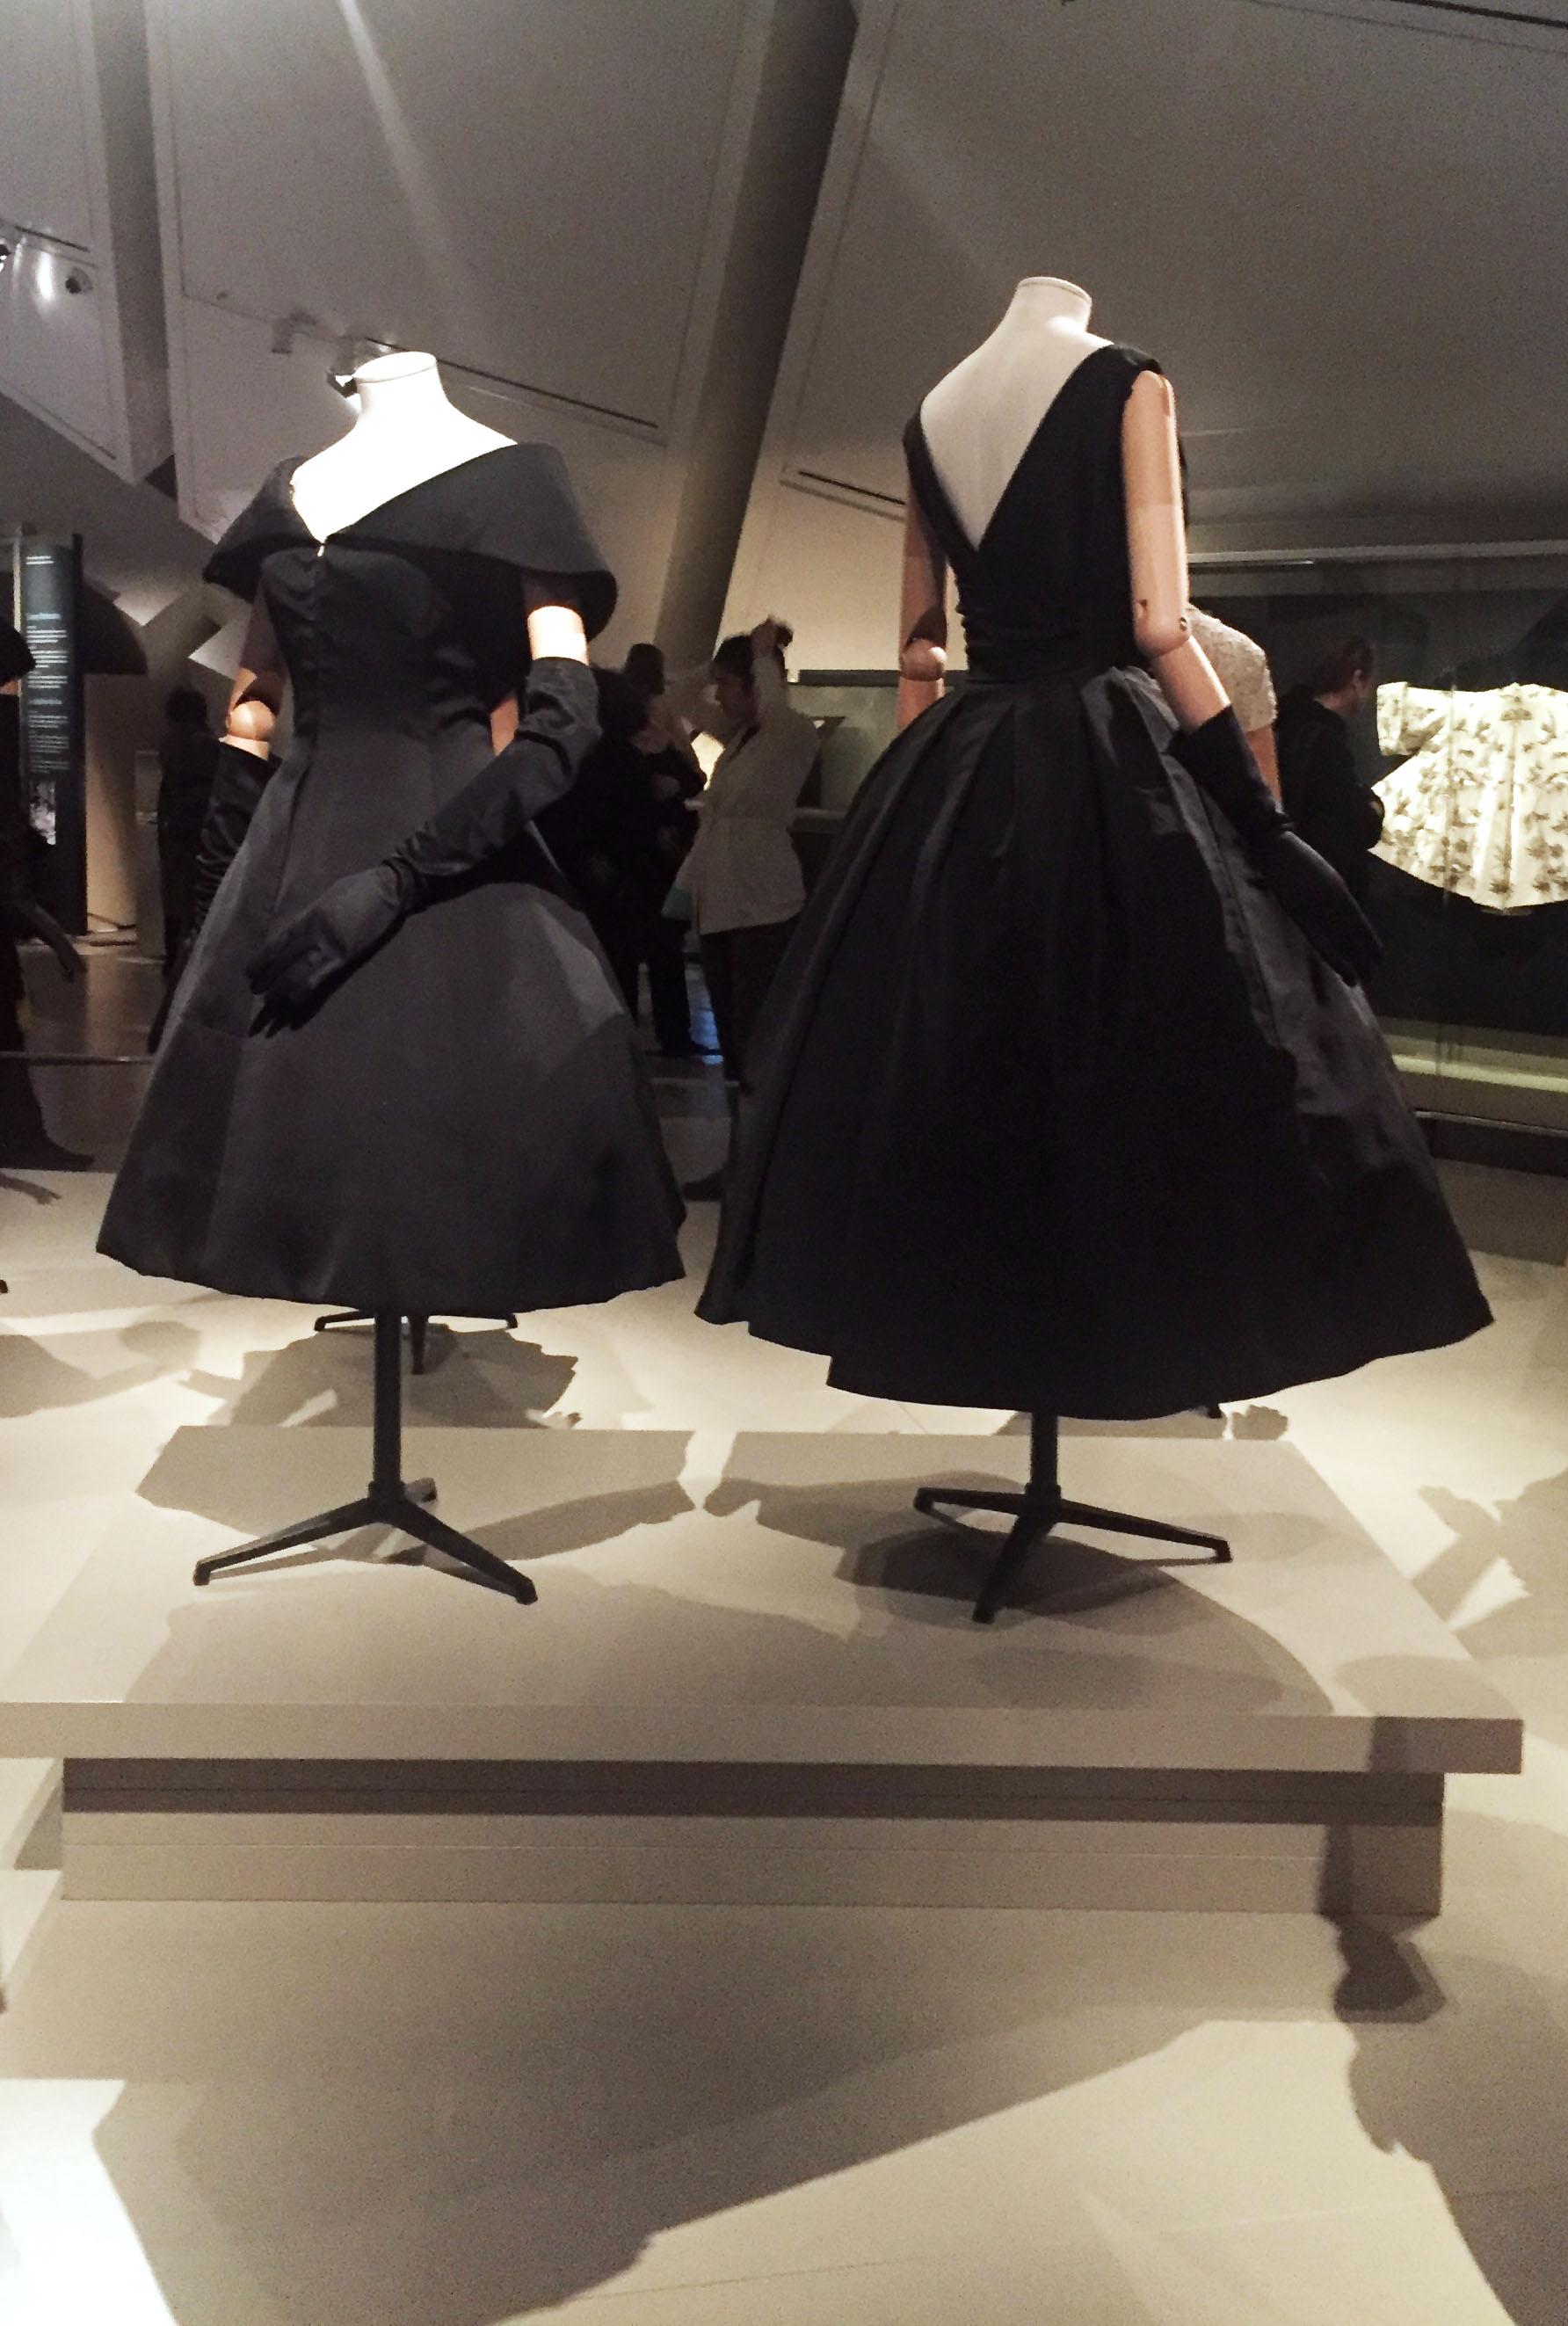 Dior Two Black Dresses.jpg